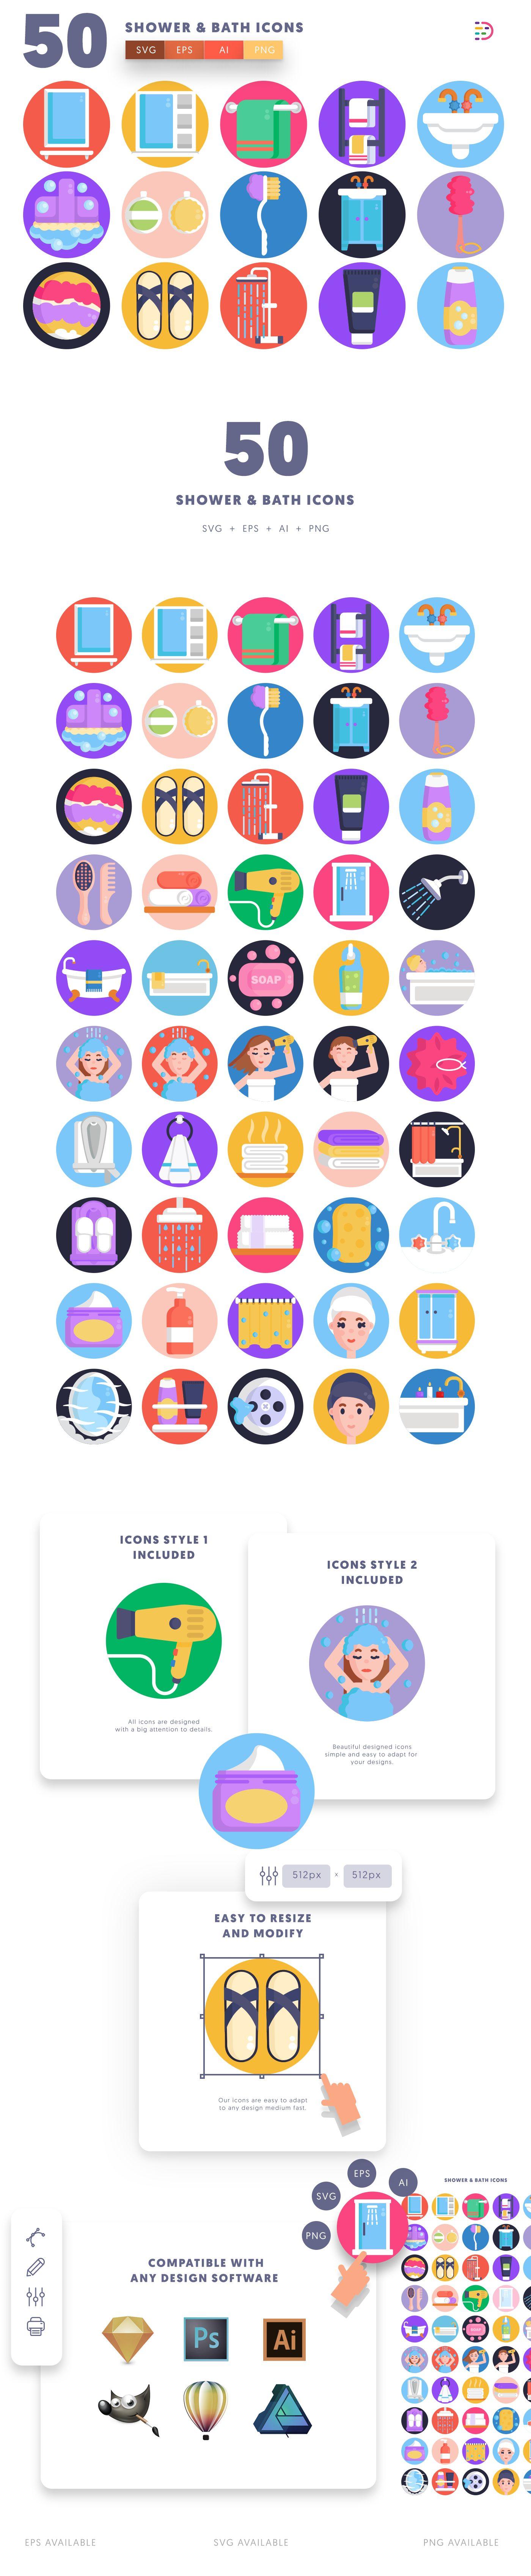 Shower & Bath icons info graphic